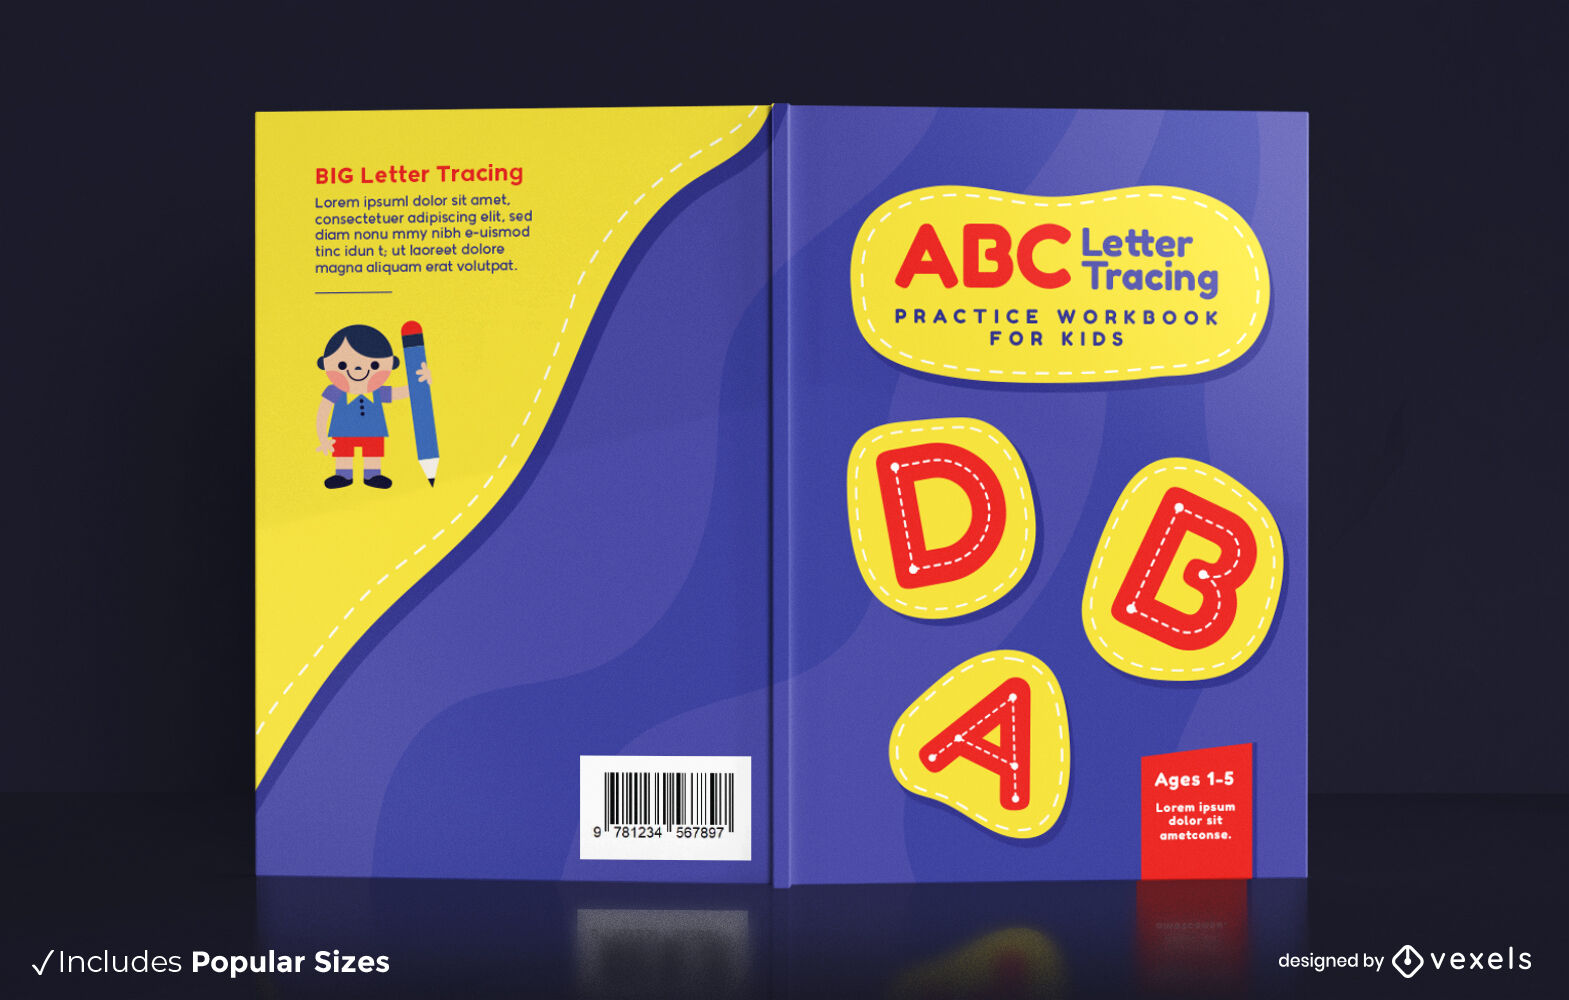 ABC letter tracing child book cover design